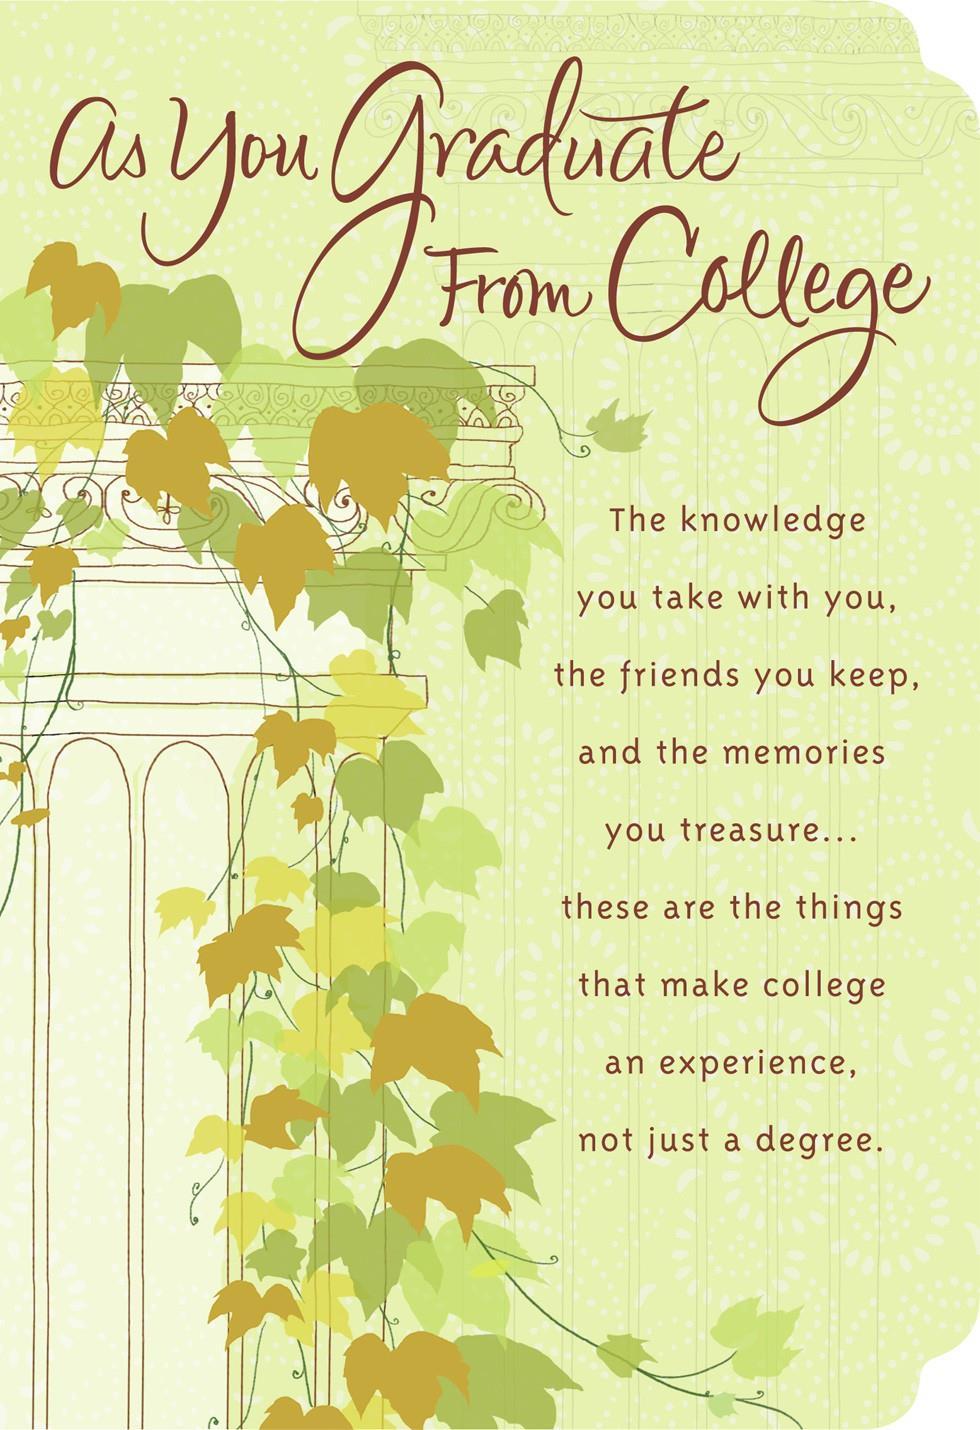 College graduation ivy greeting card greeting cards hallmark college graduation ivy greeting card m4hsunfo